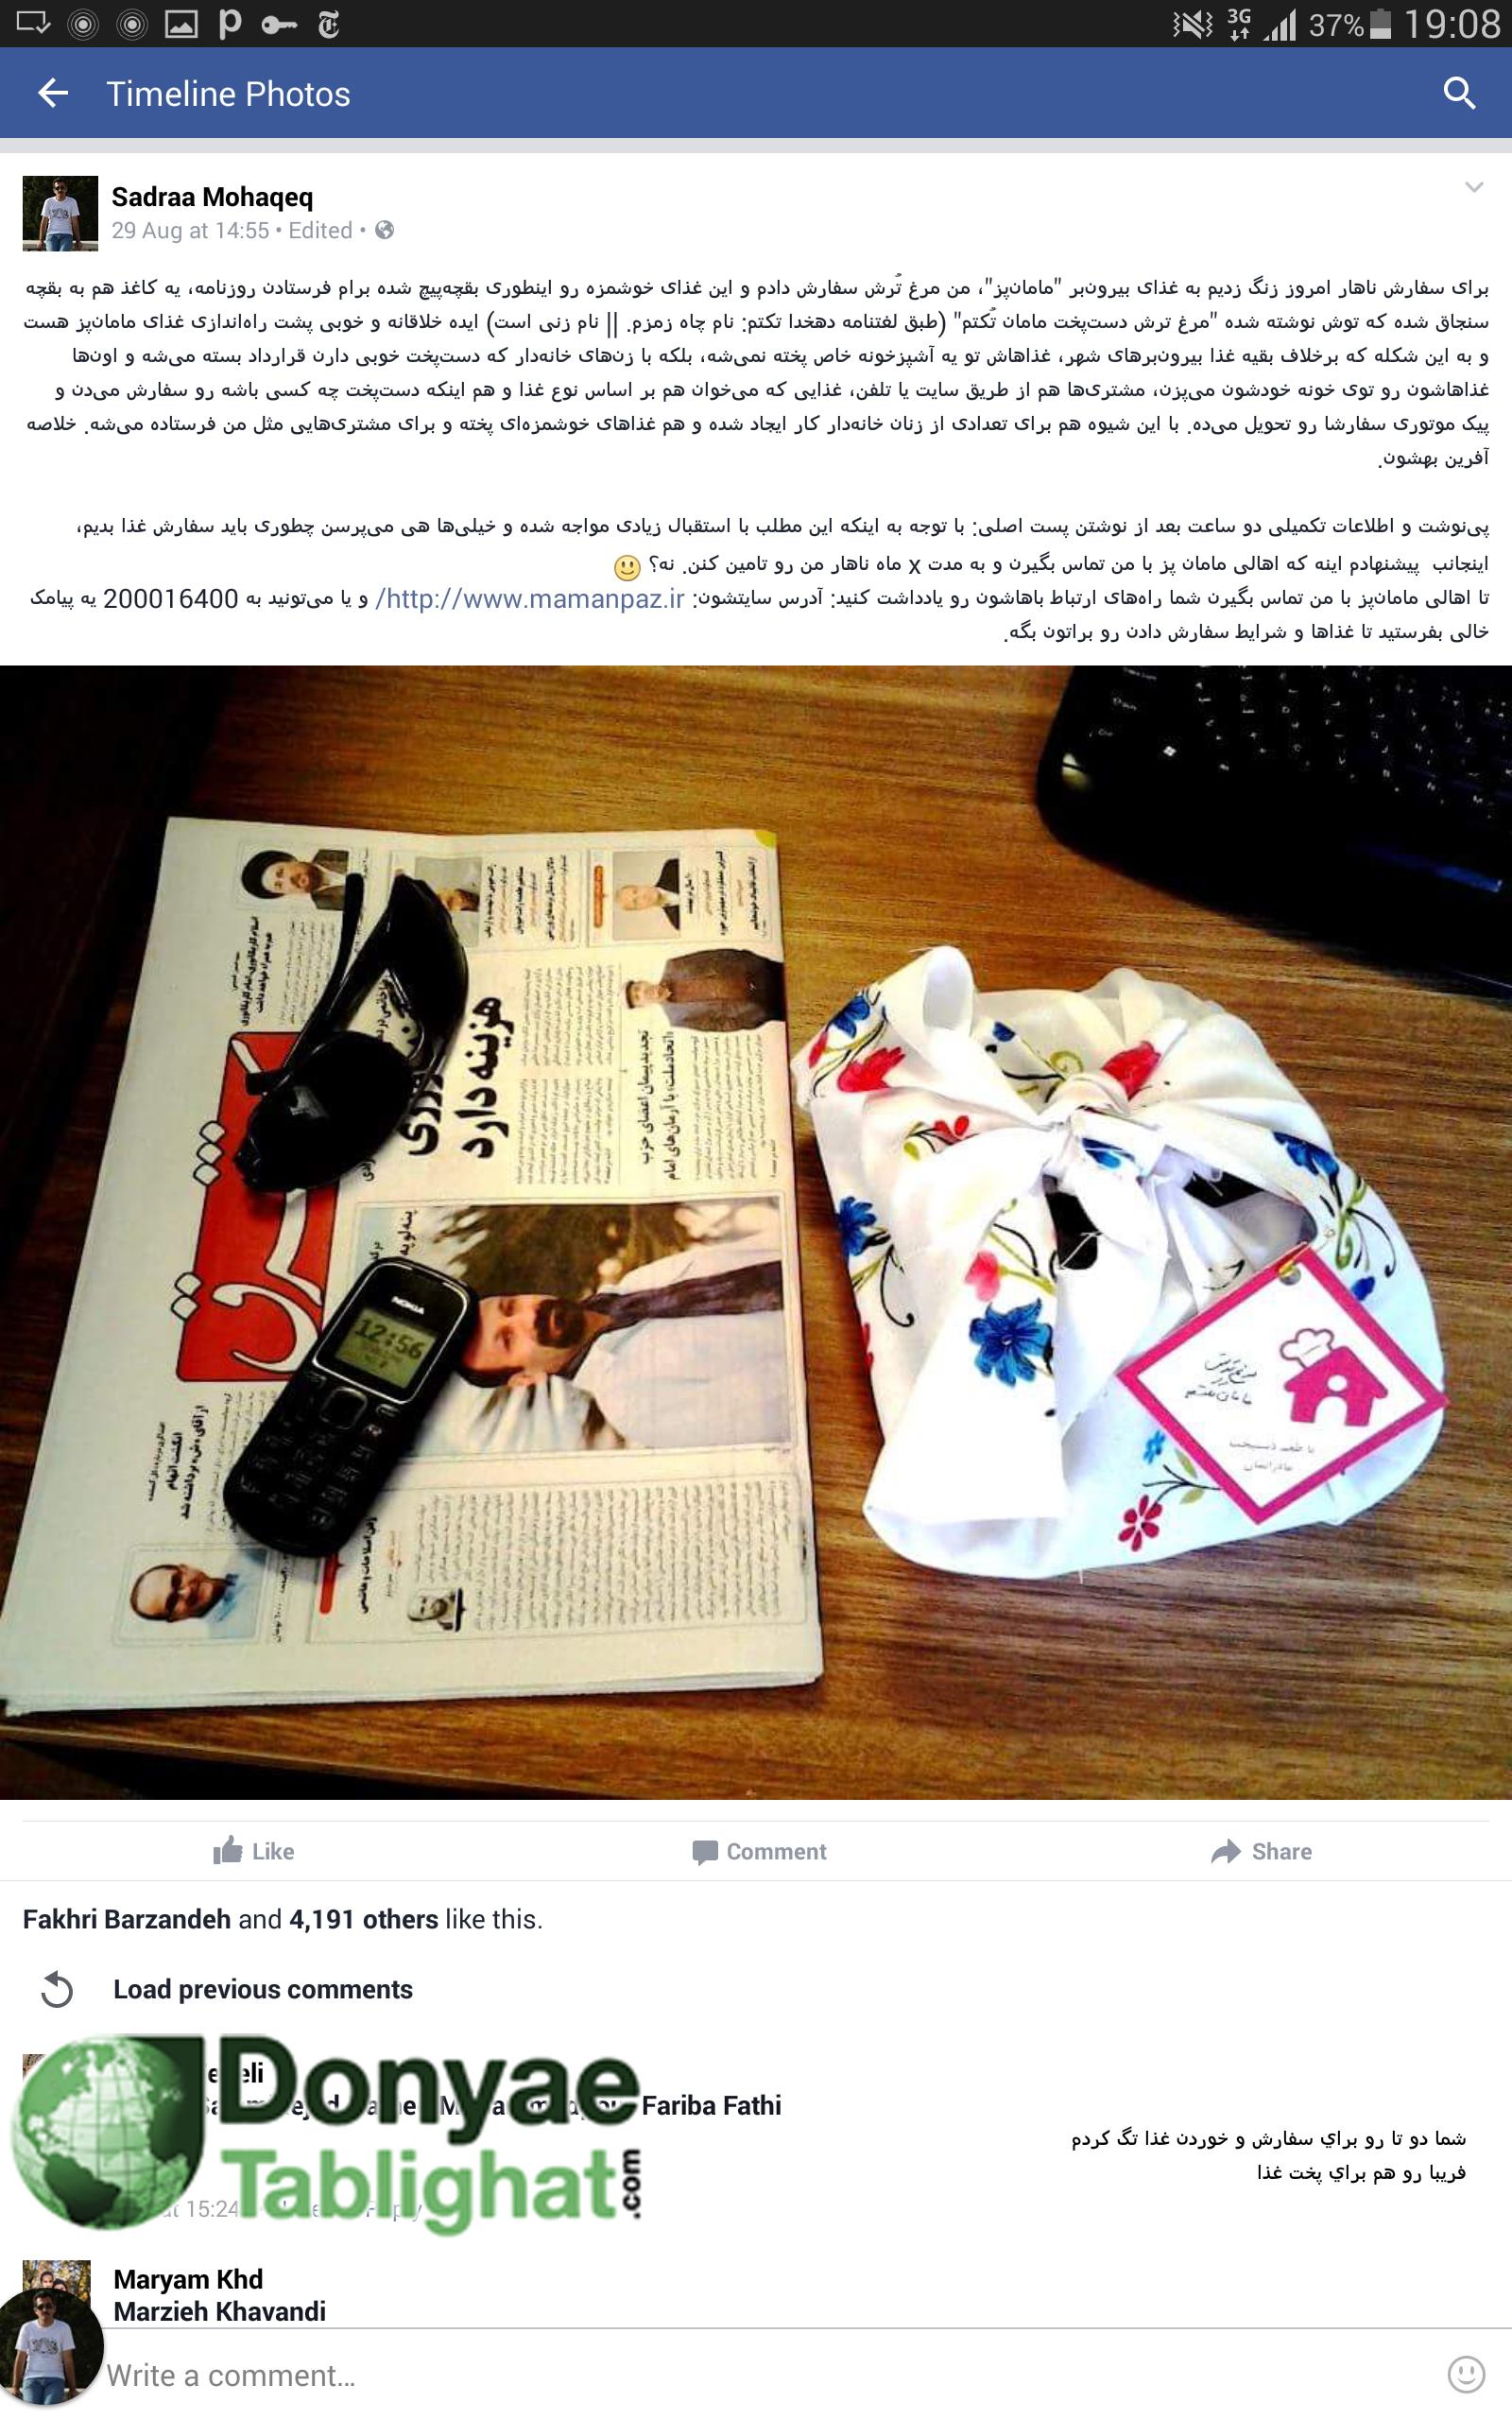 Screenshot_2015-08-31-19-08-39 copy